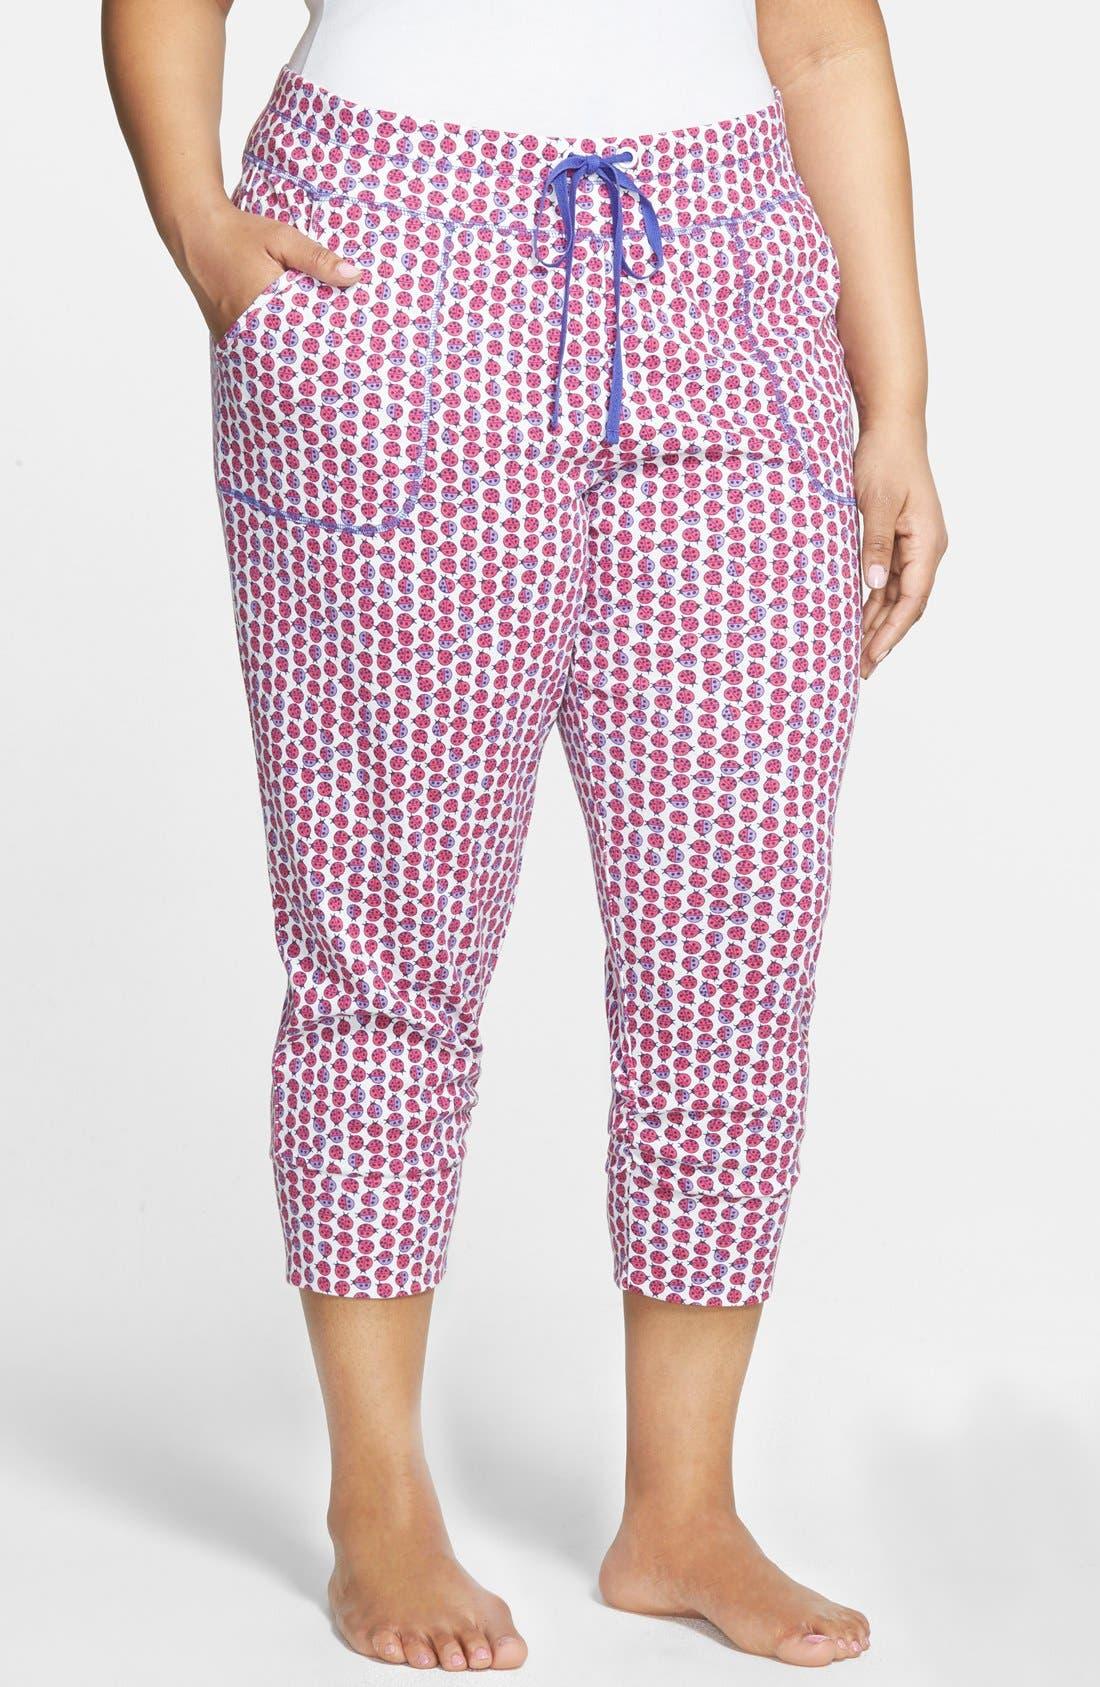 Alternate Image 1 Selected - Jane & Bleecker New York Print Rib Knit Capri Leggings (Plus Size)